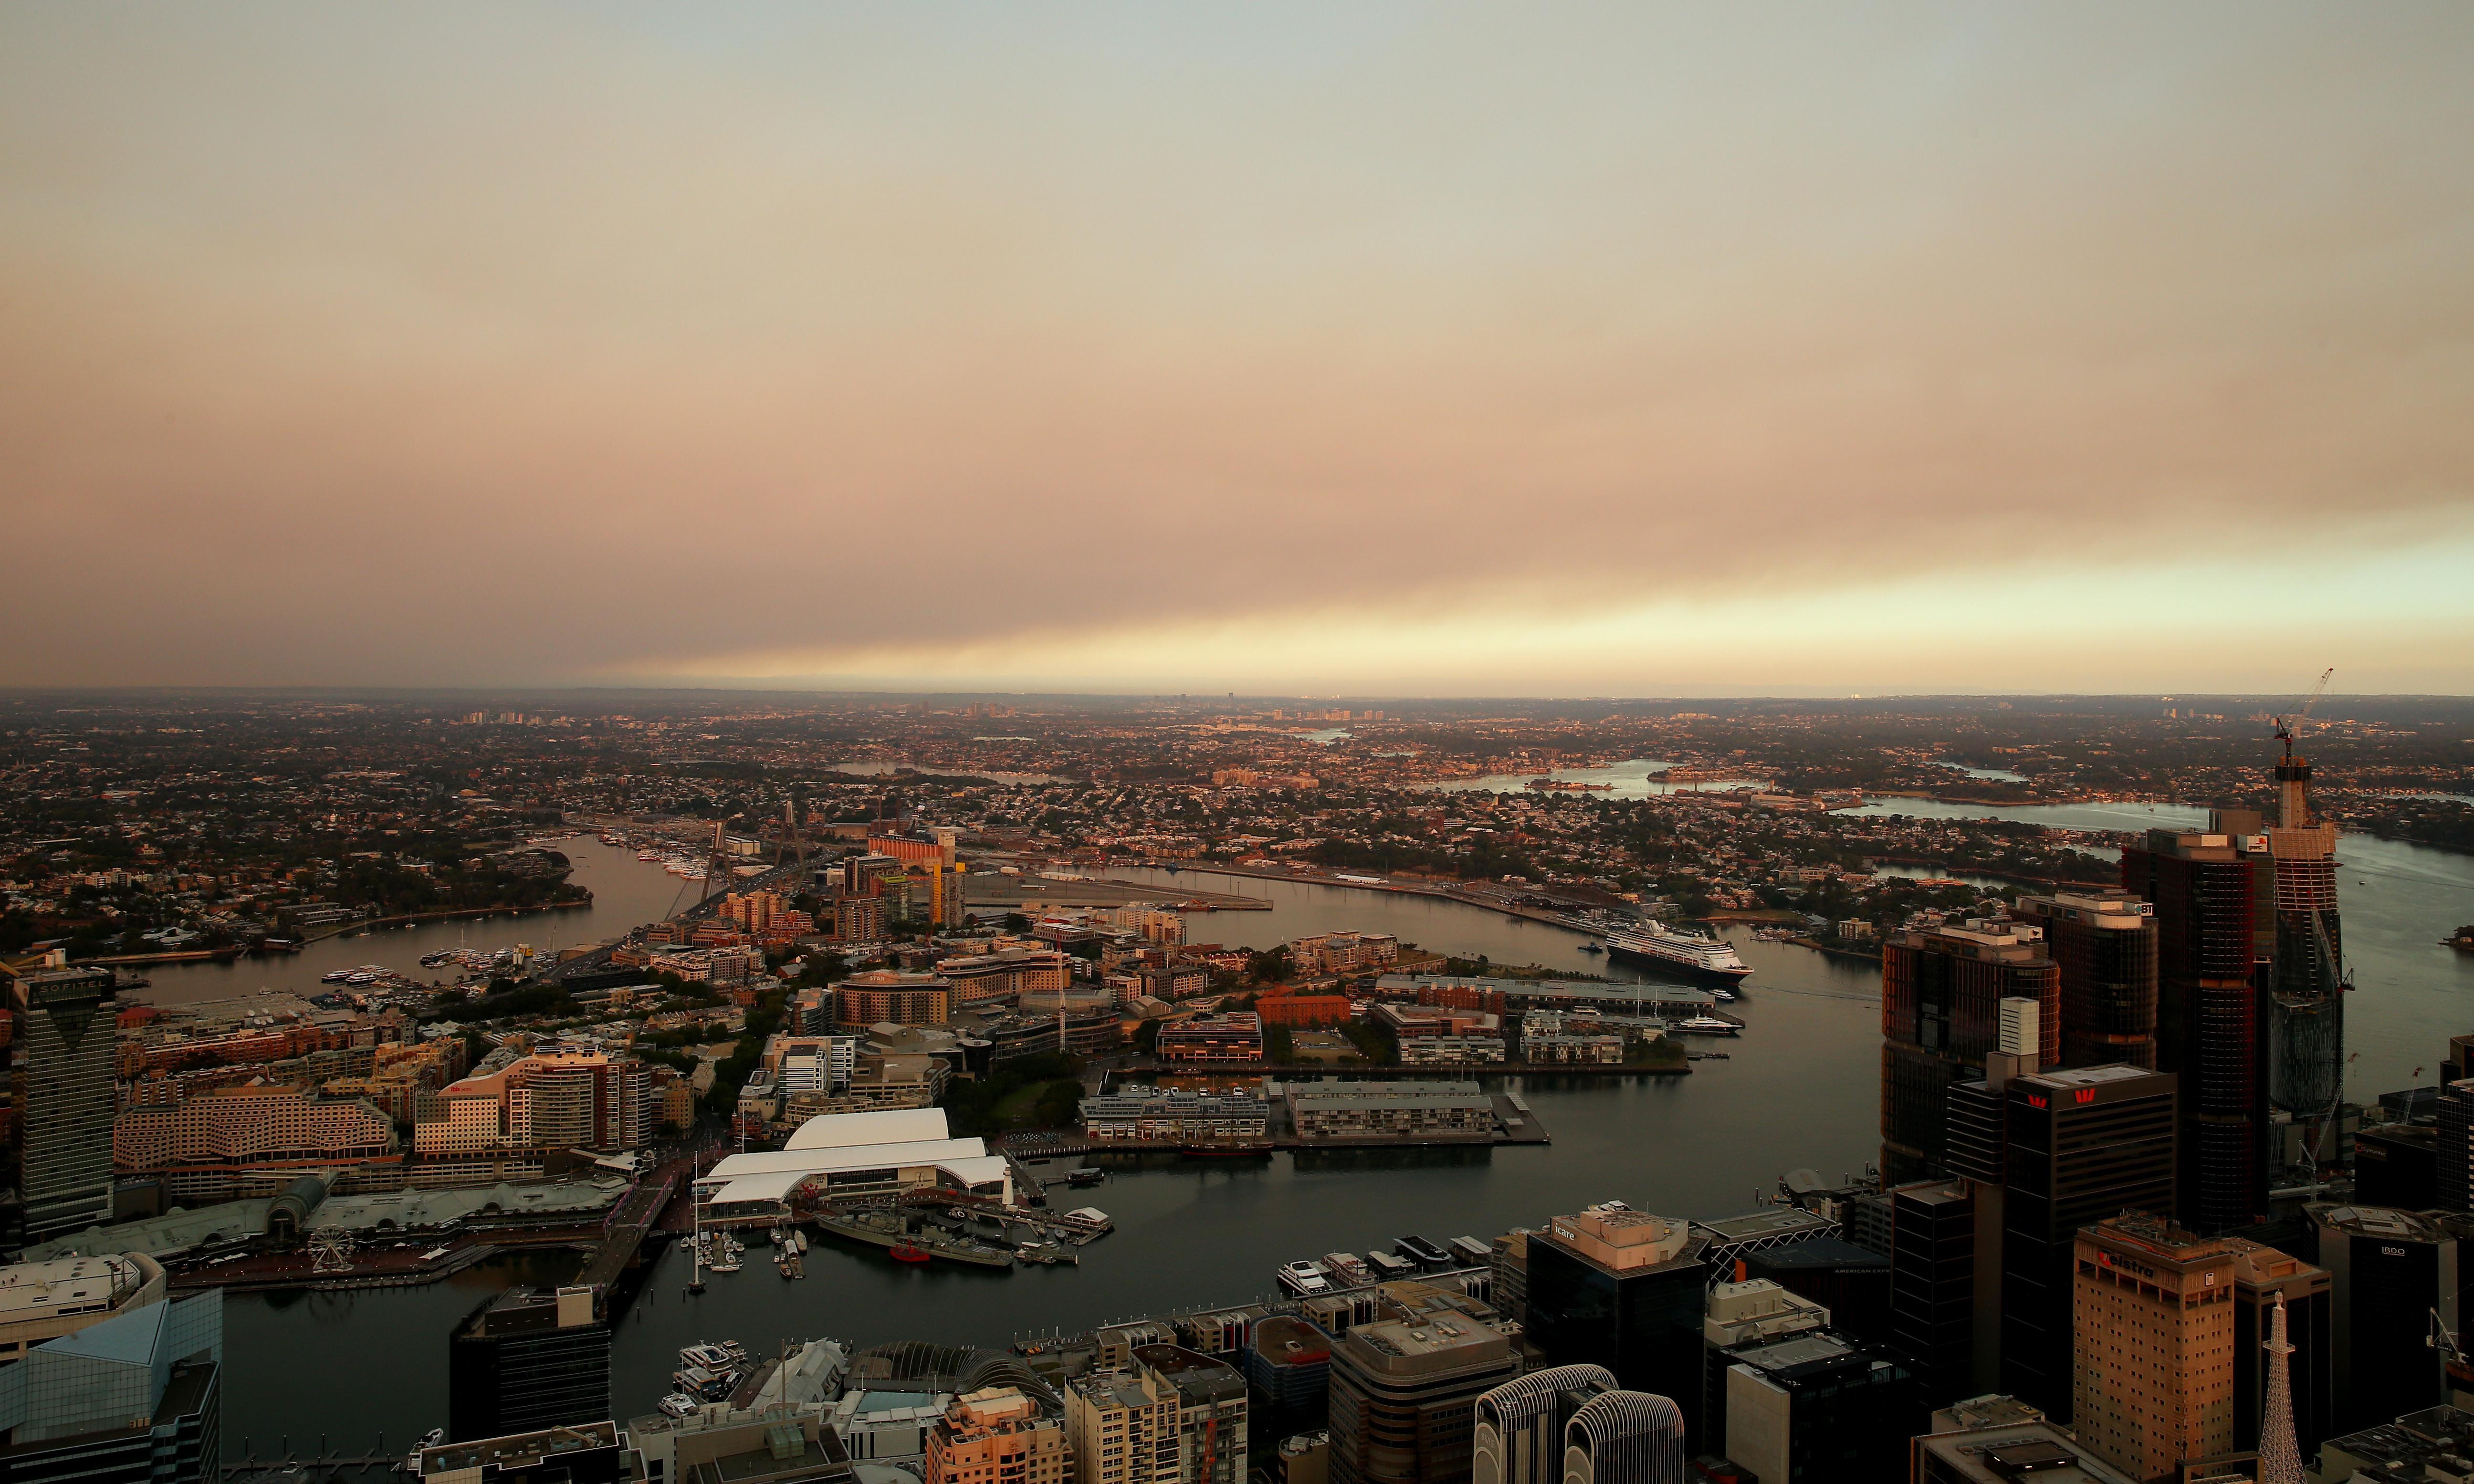 More homes threatened by NSW bushfires as hazardous smoke blankets Sydney